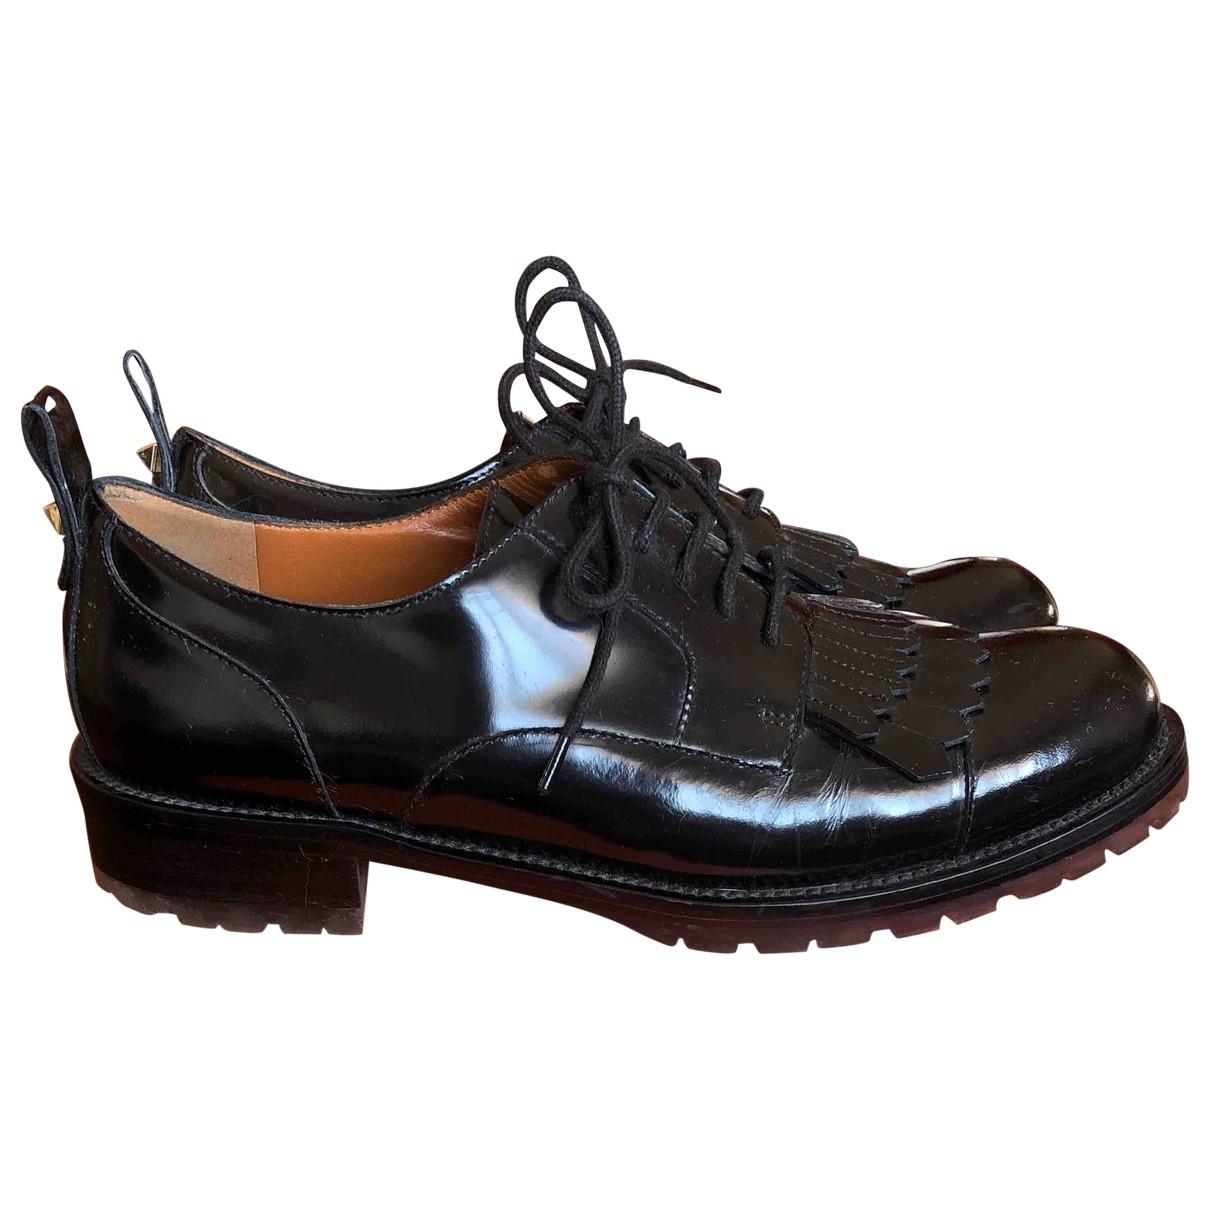 Valentino Garavani Rockstud Black Patent leather Lace ups for Women 38.5 EU